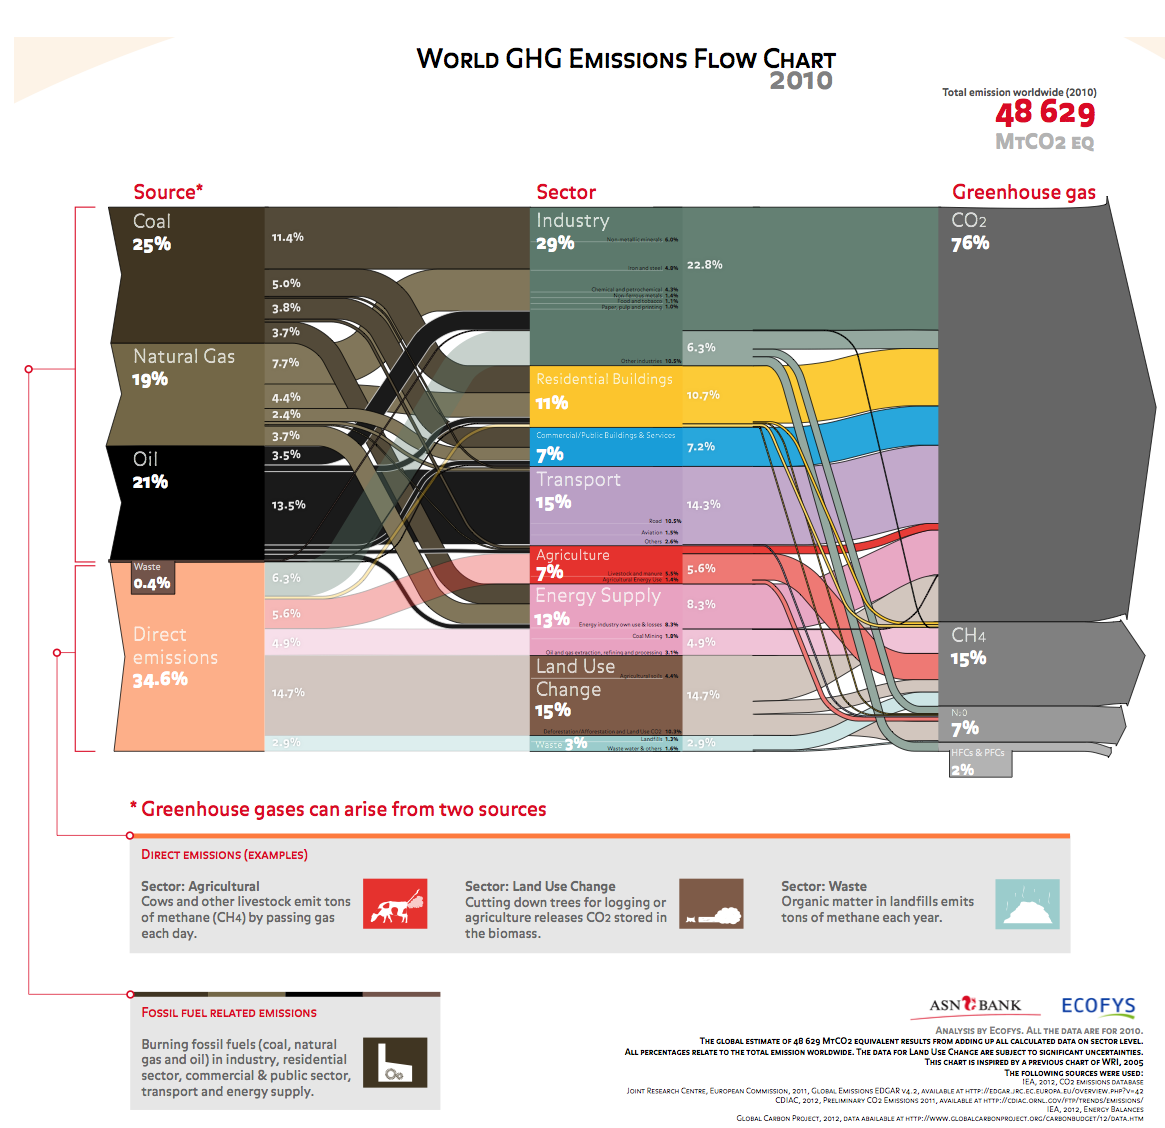 Greenhouse gas emissions flowchart